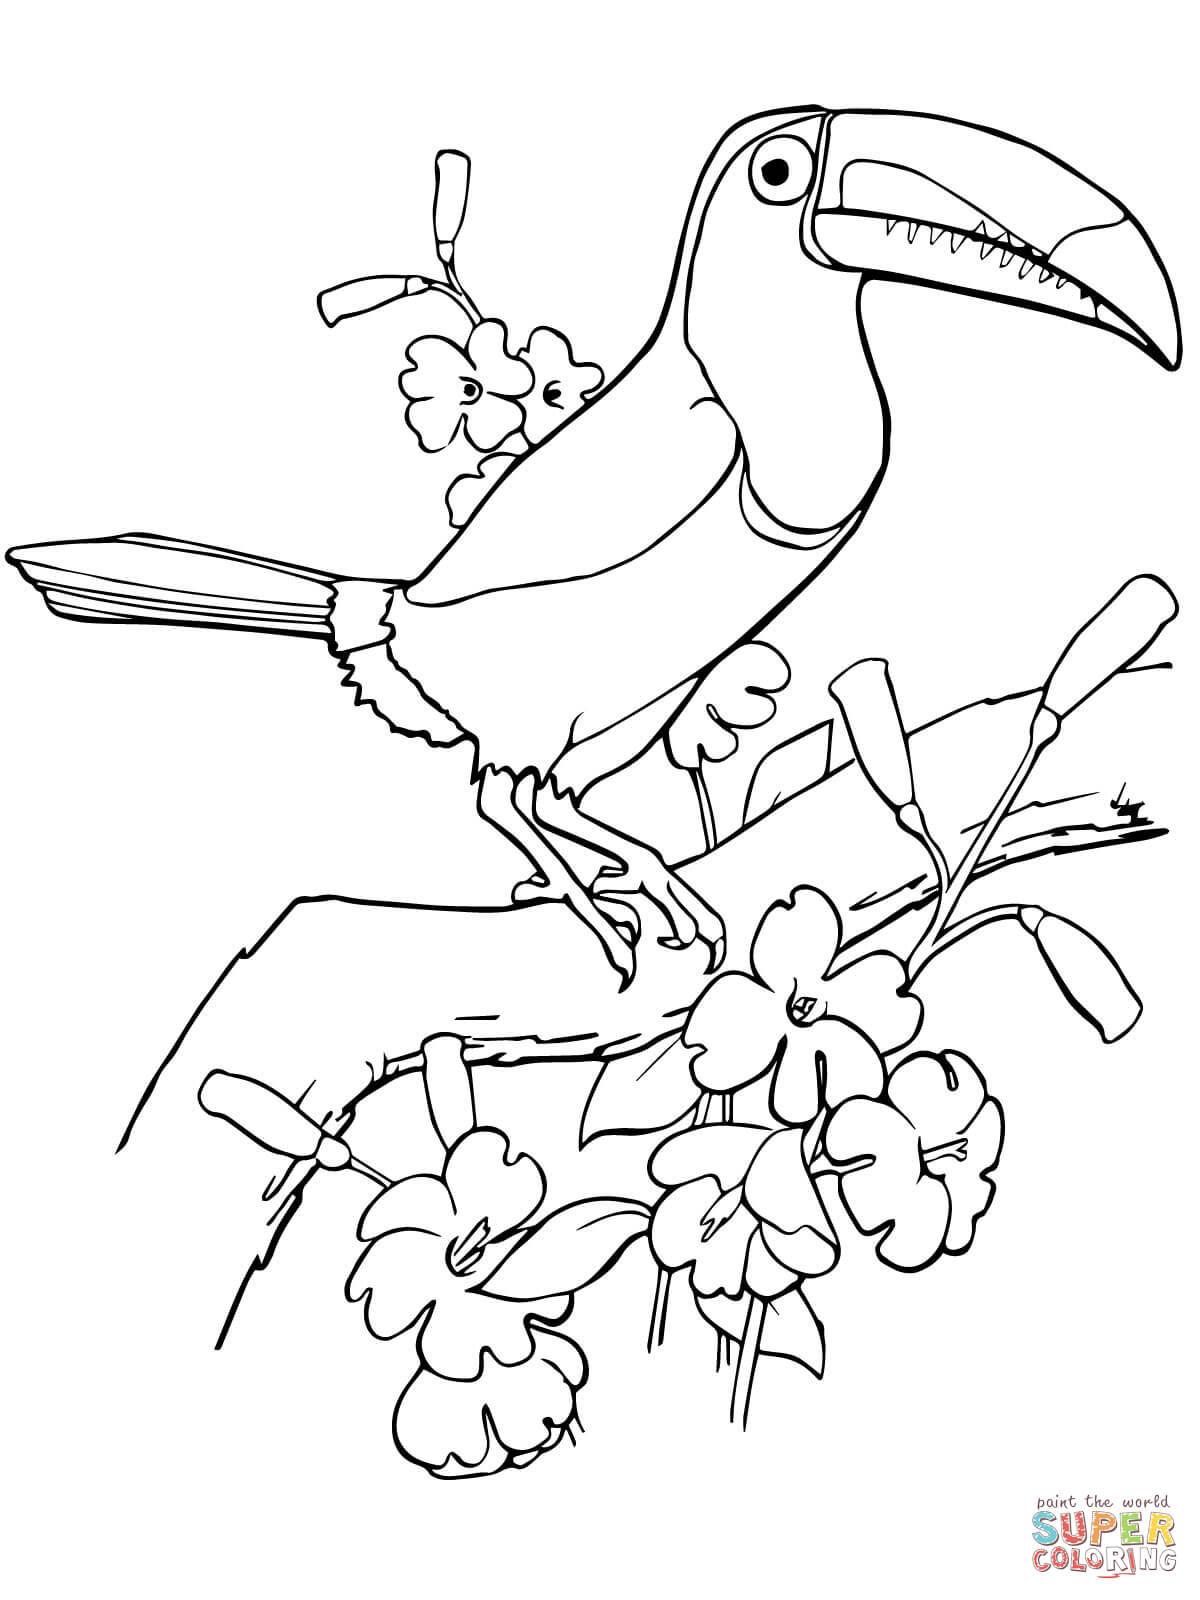 Dibujo De Tucan Pico Iris Para Colorear